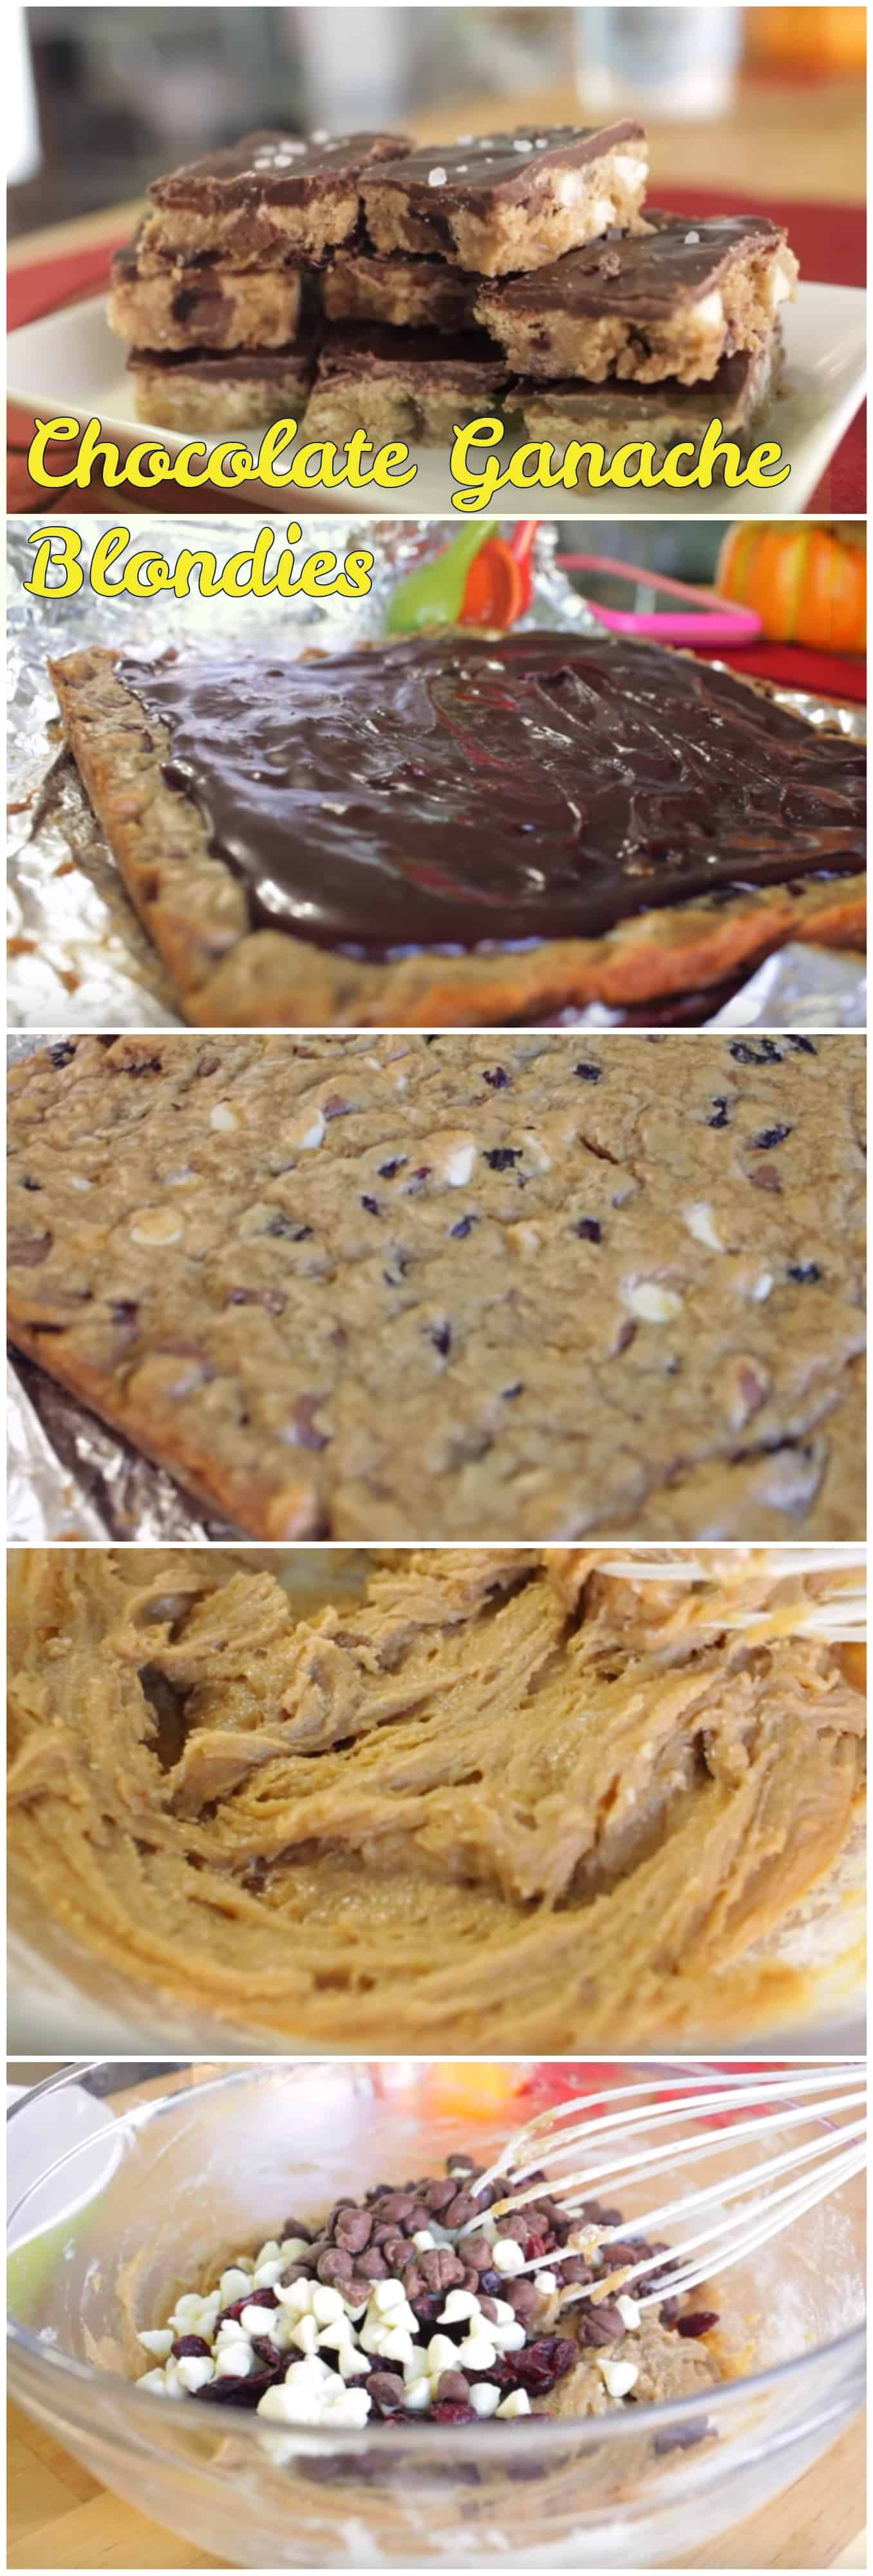 Chocolate Ganache Blondies - Simply Bakings